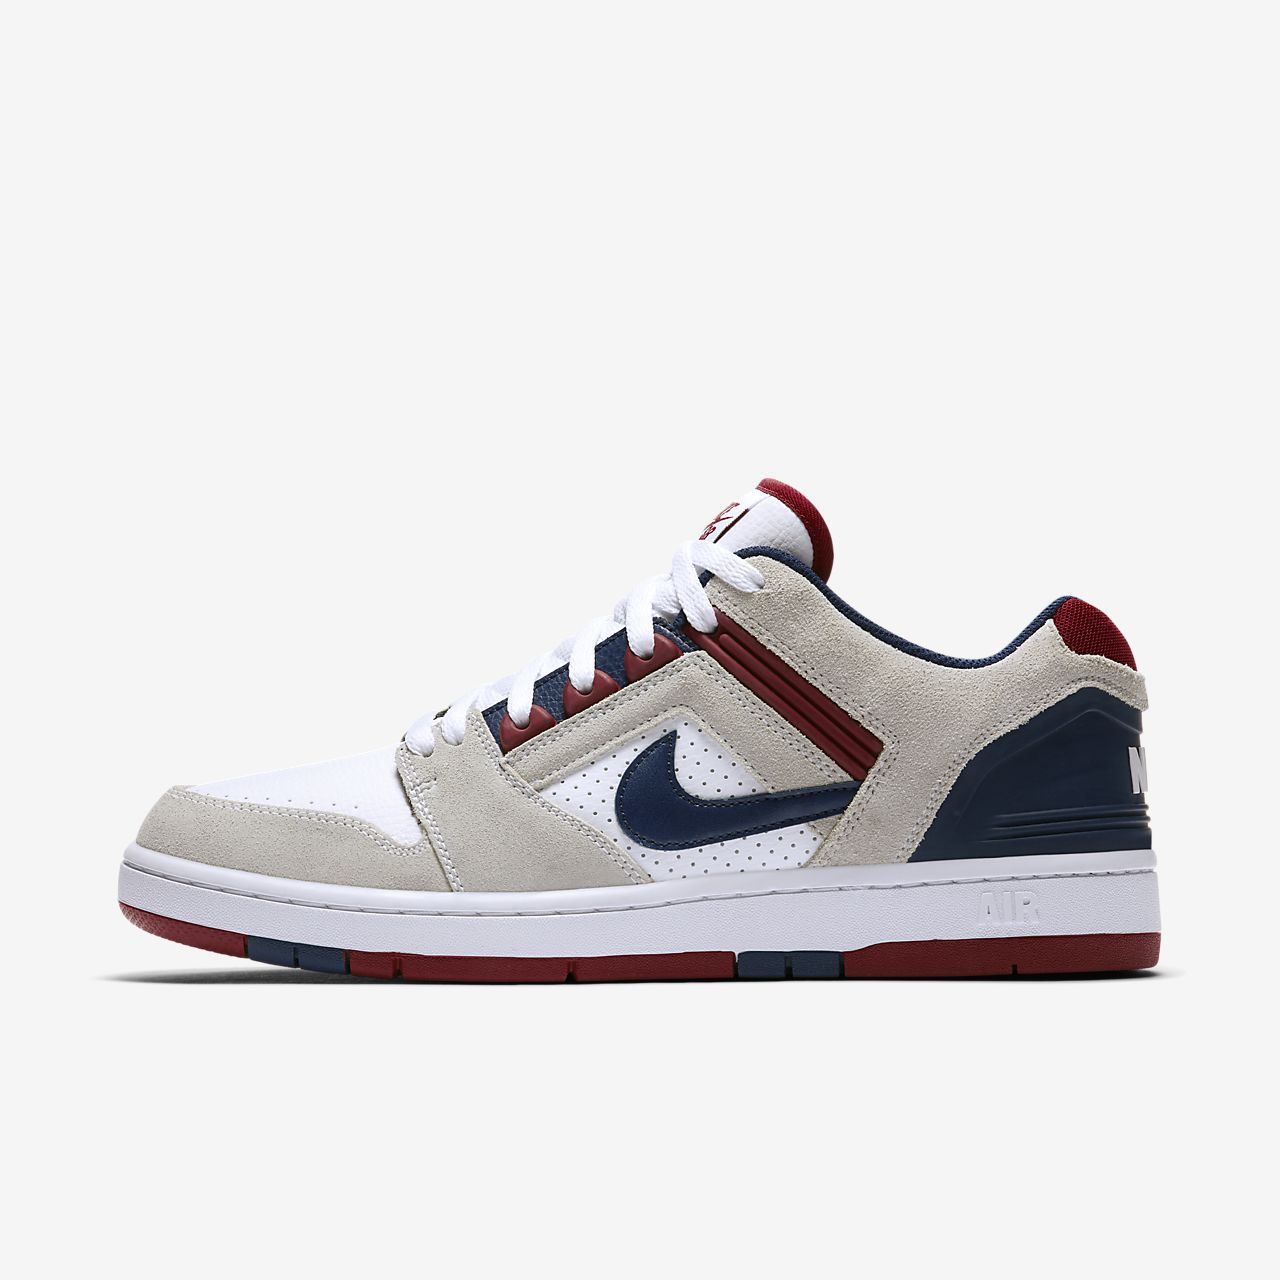 Nike SB Air Force II Low 男/女滑板鞋